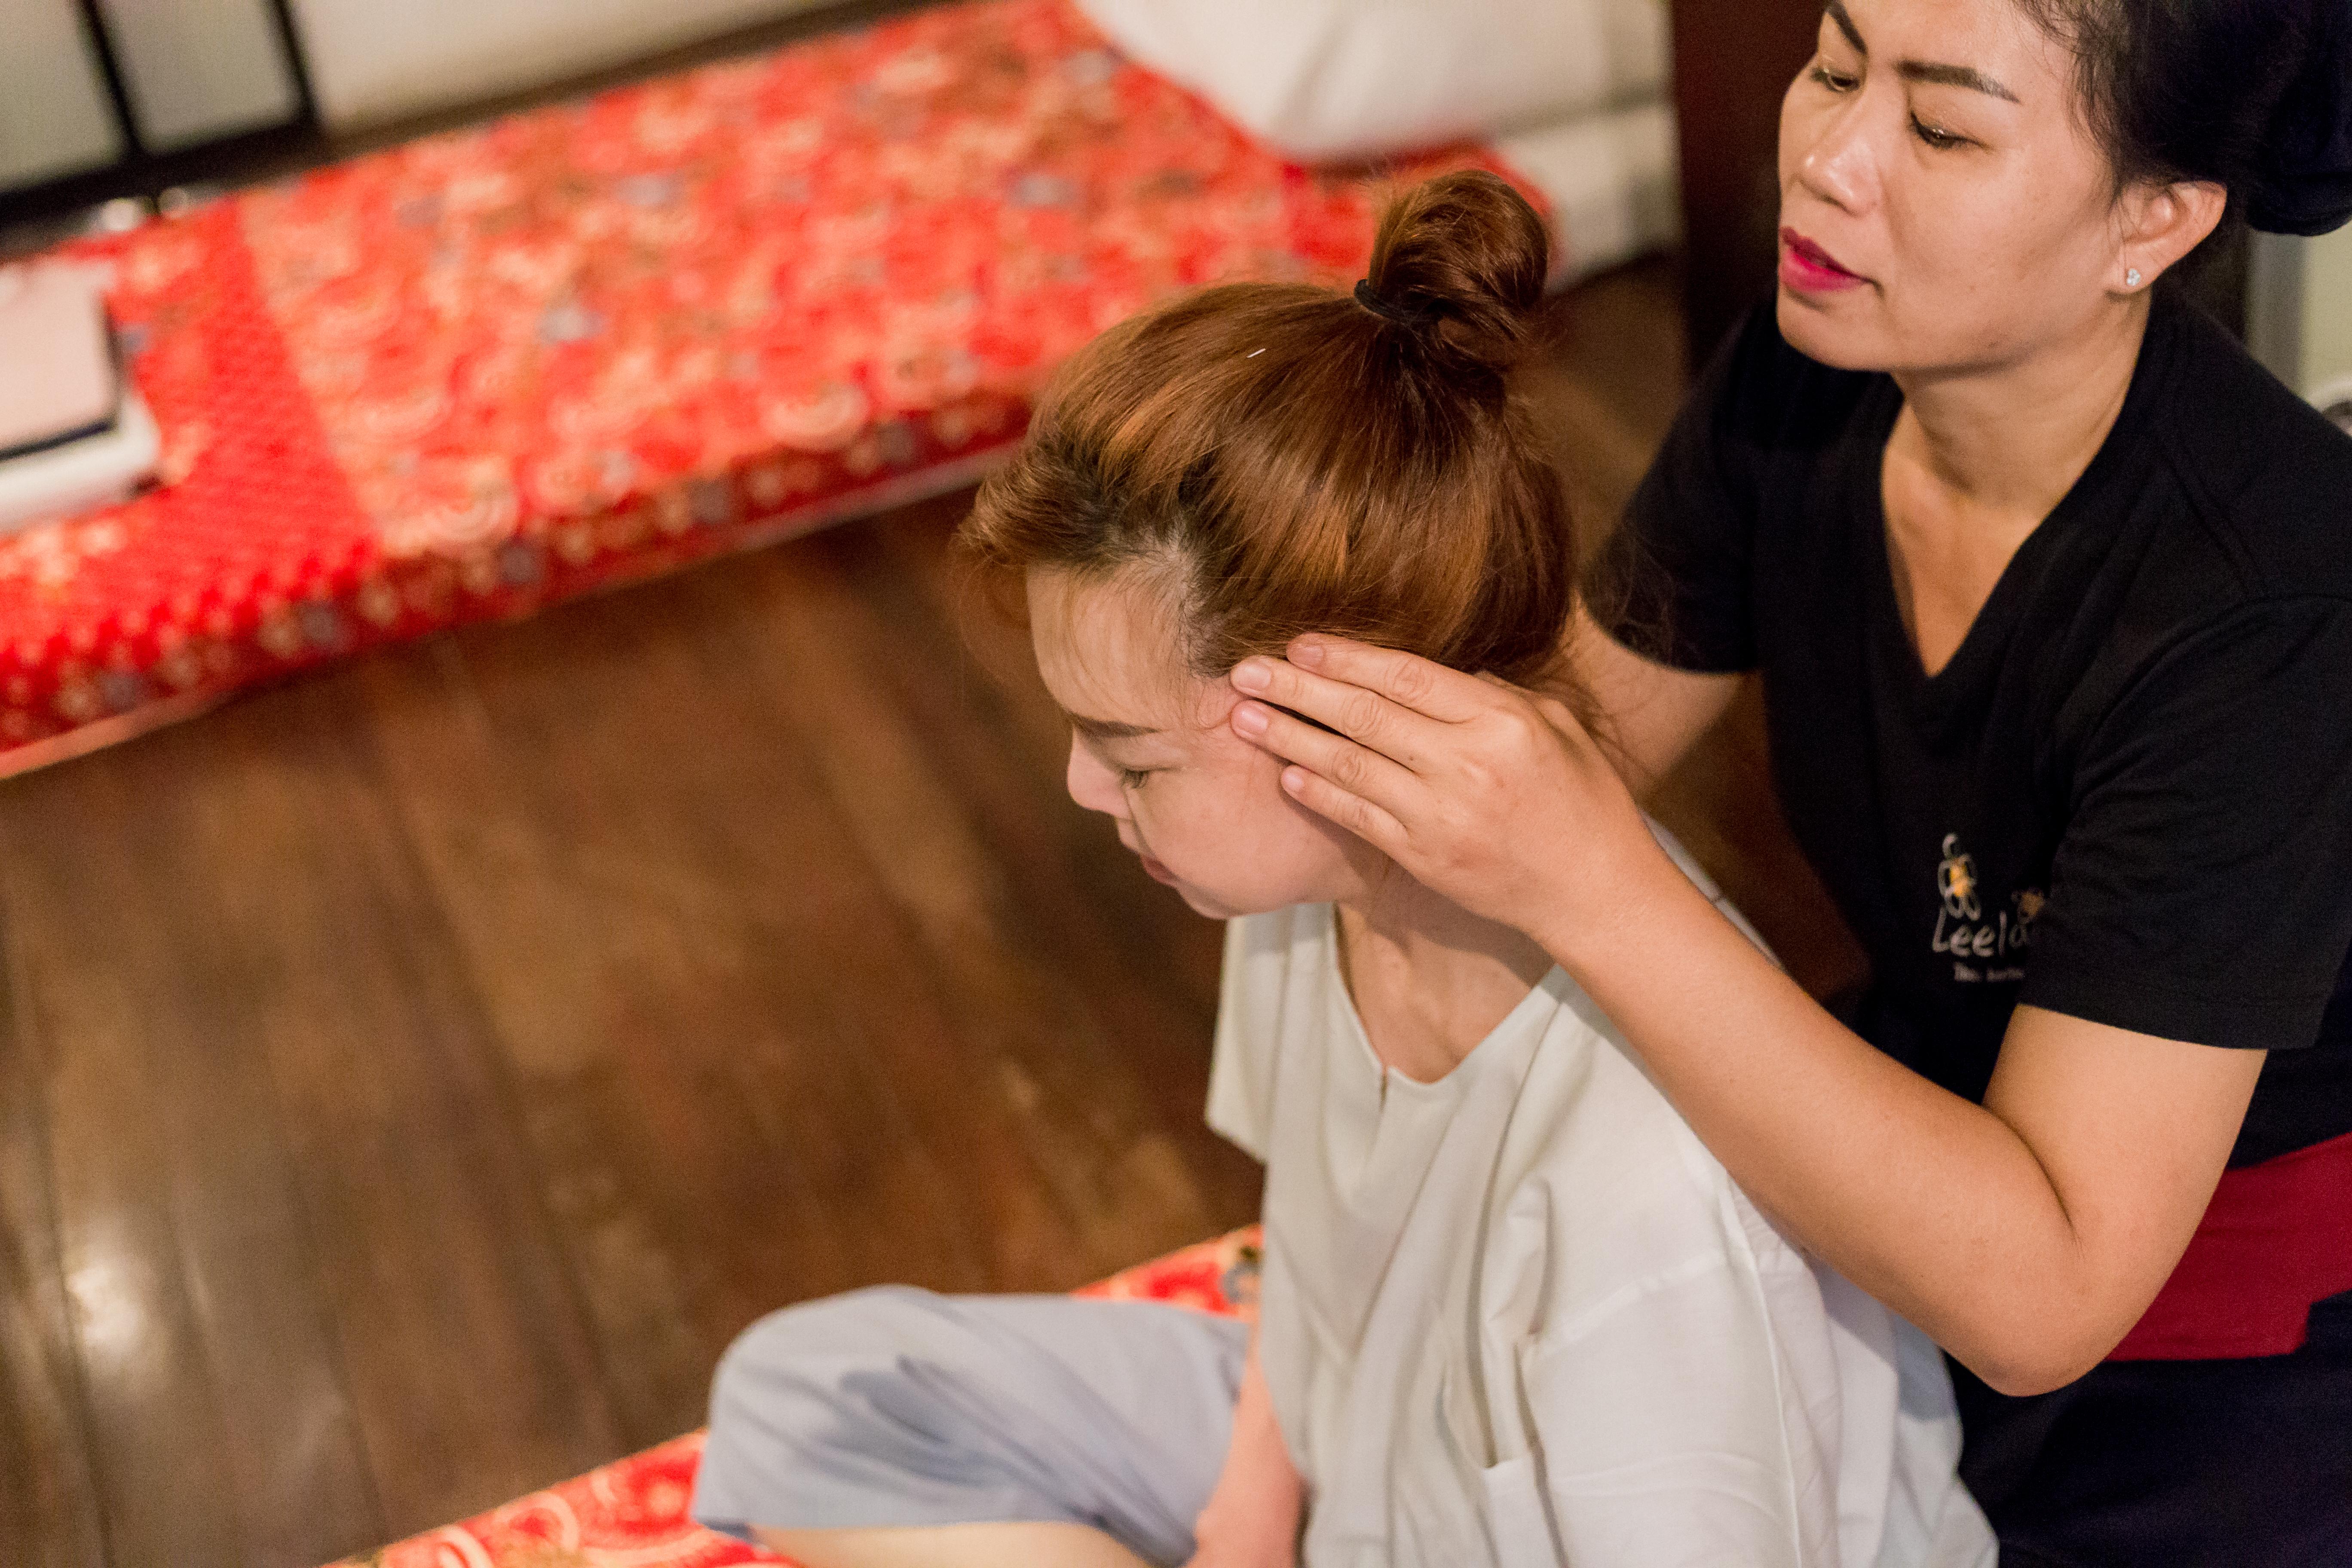 Head Neck Shoulder Massage